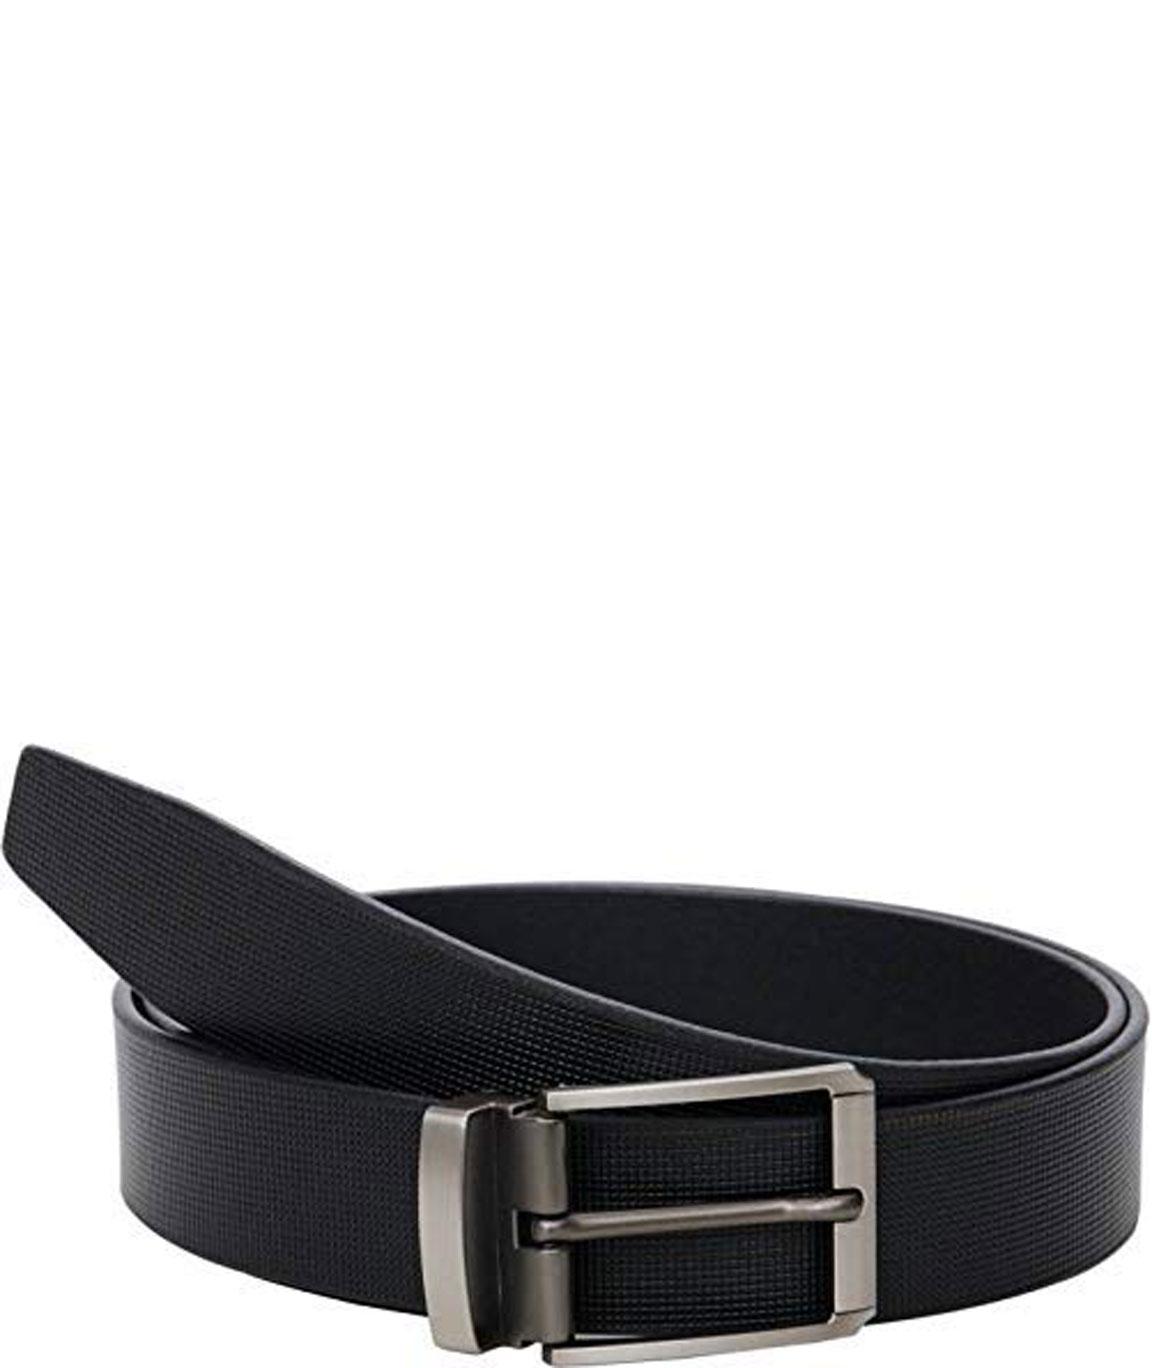 ZORO Men`s Genuine Leather Black Belt-1 Year Money back Guarantee-belts for mens-leather belt for men formal branded-genuine leather belt for men SQBR-09